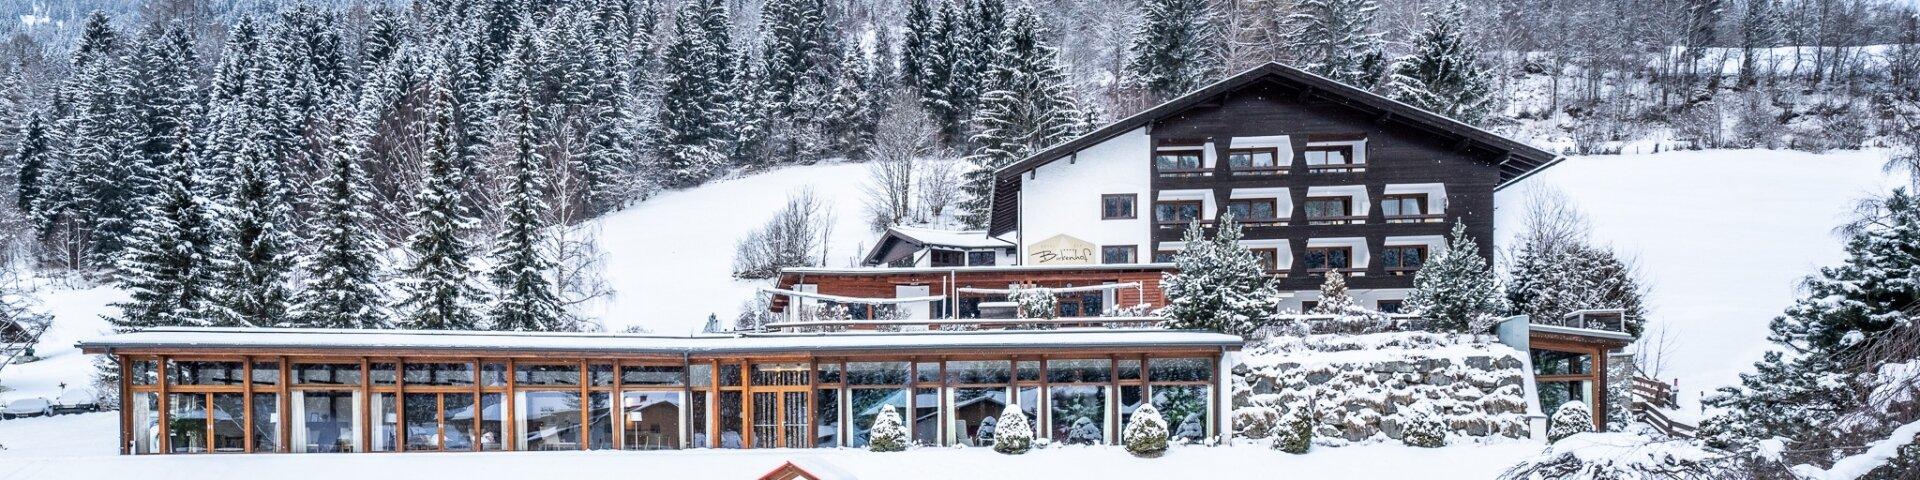 Advent in den Alpen